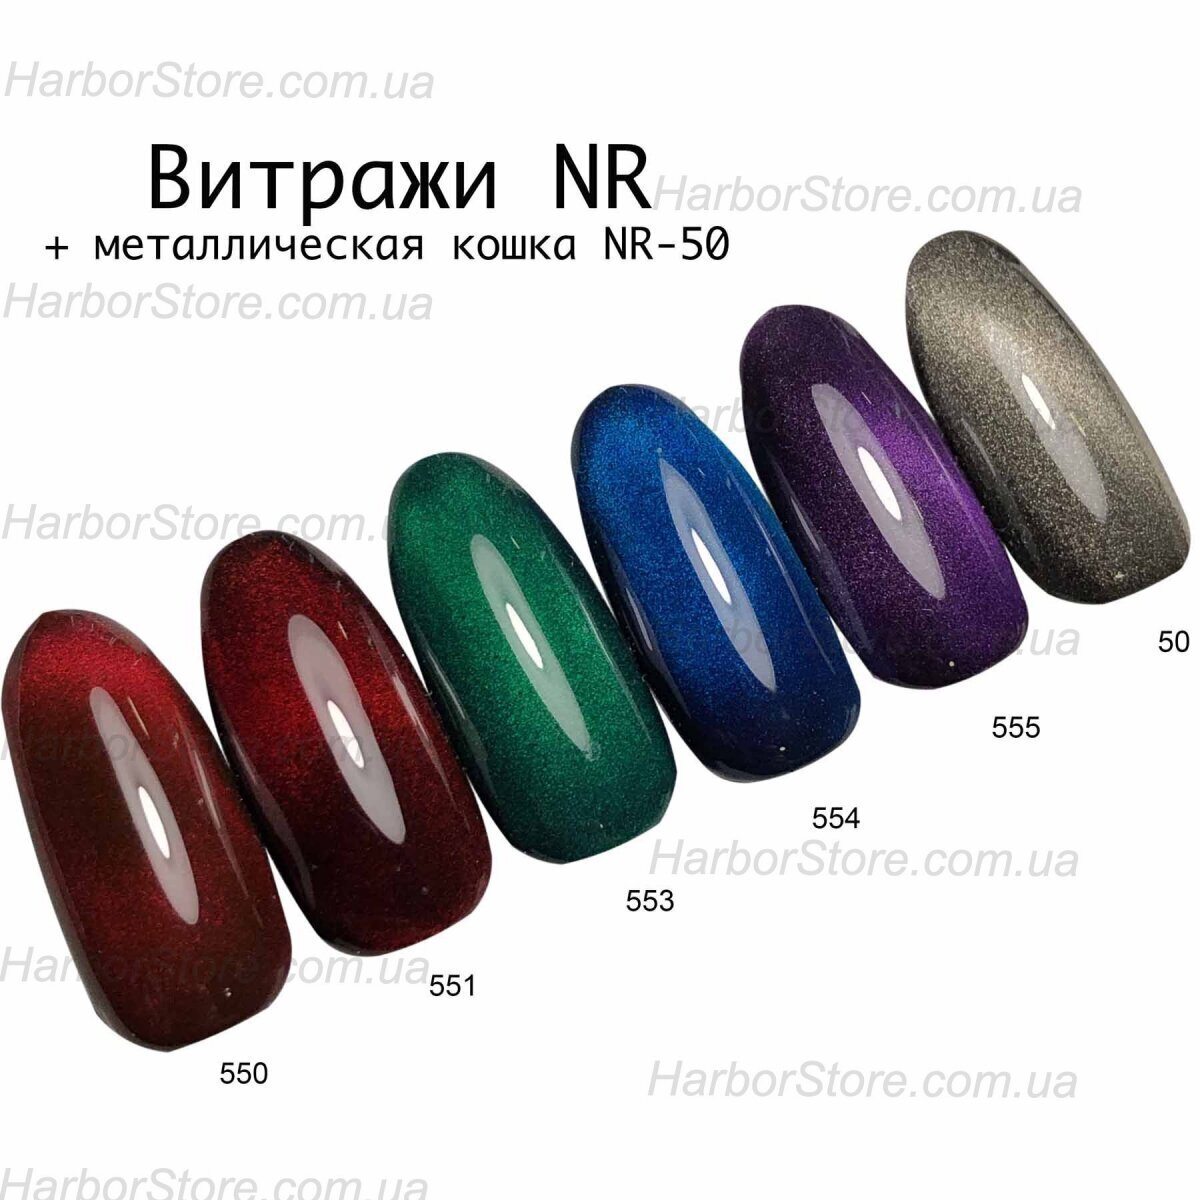 NR 554